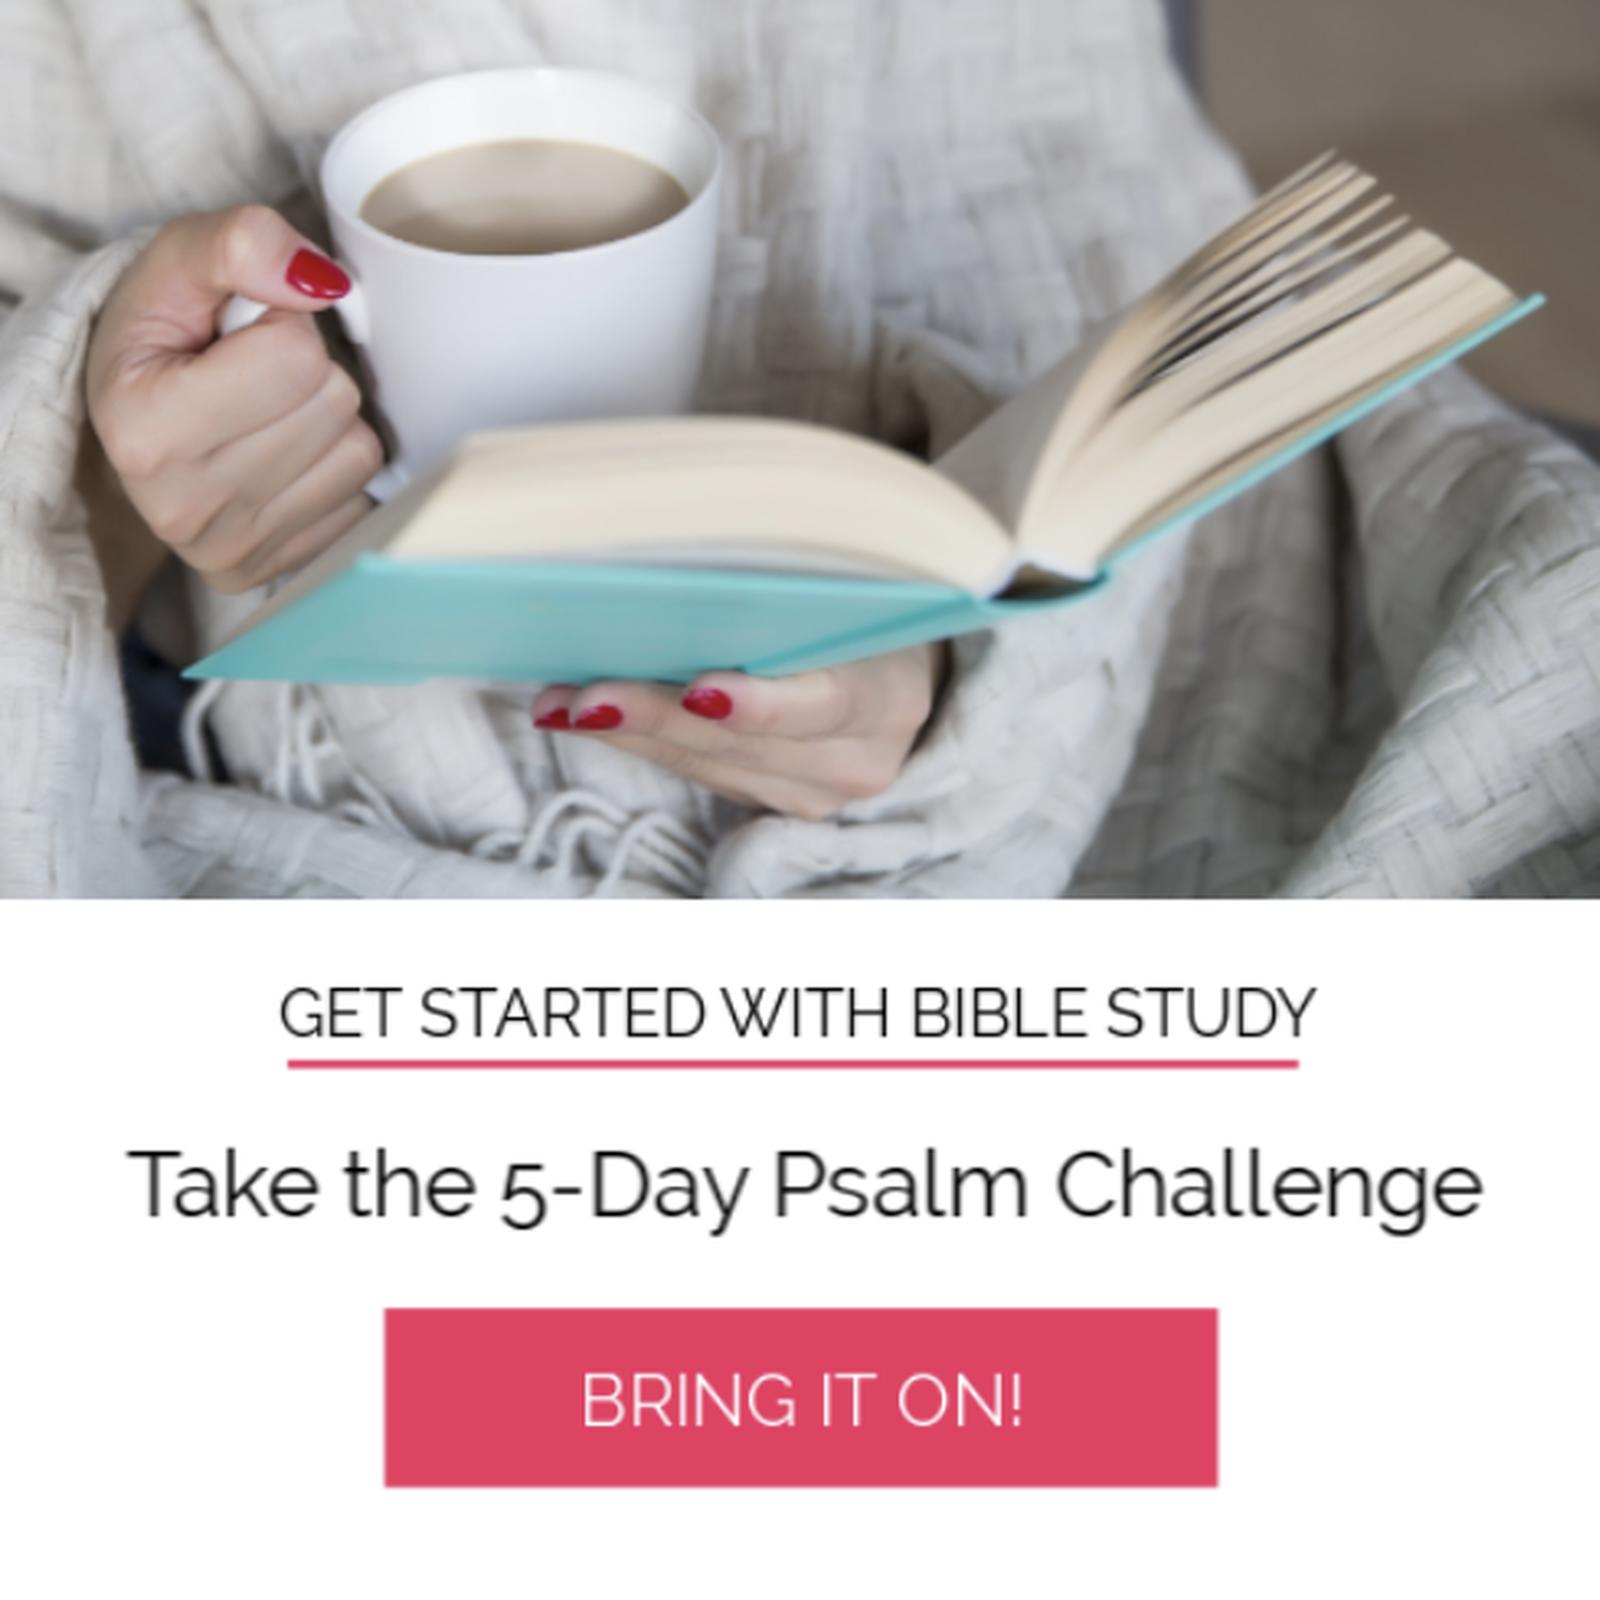 gig psalm challenge girlfriends in god